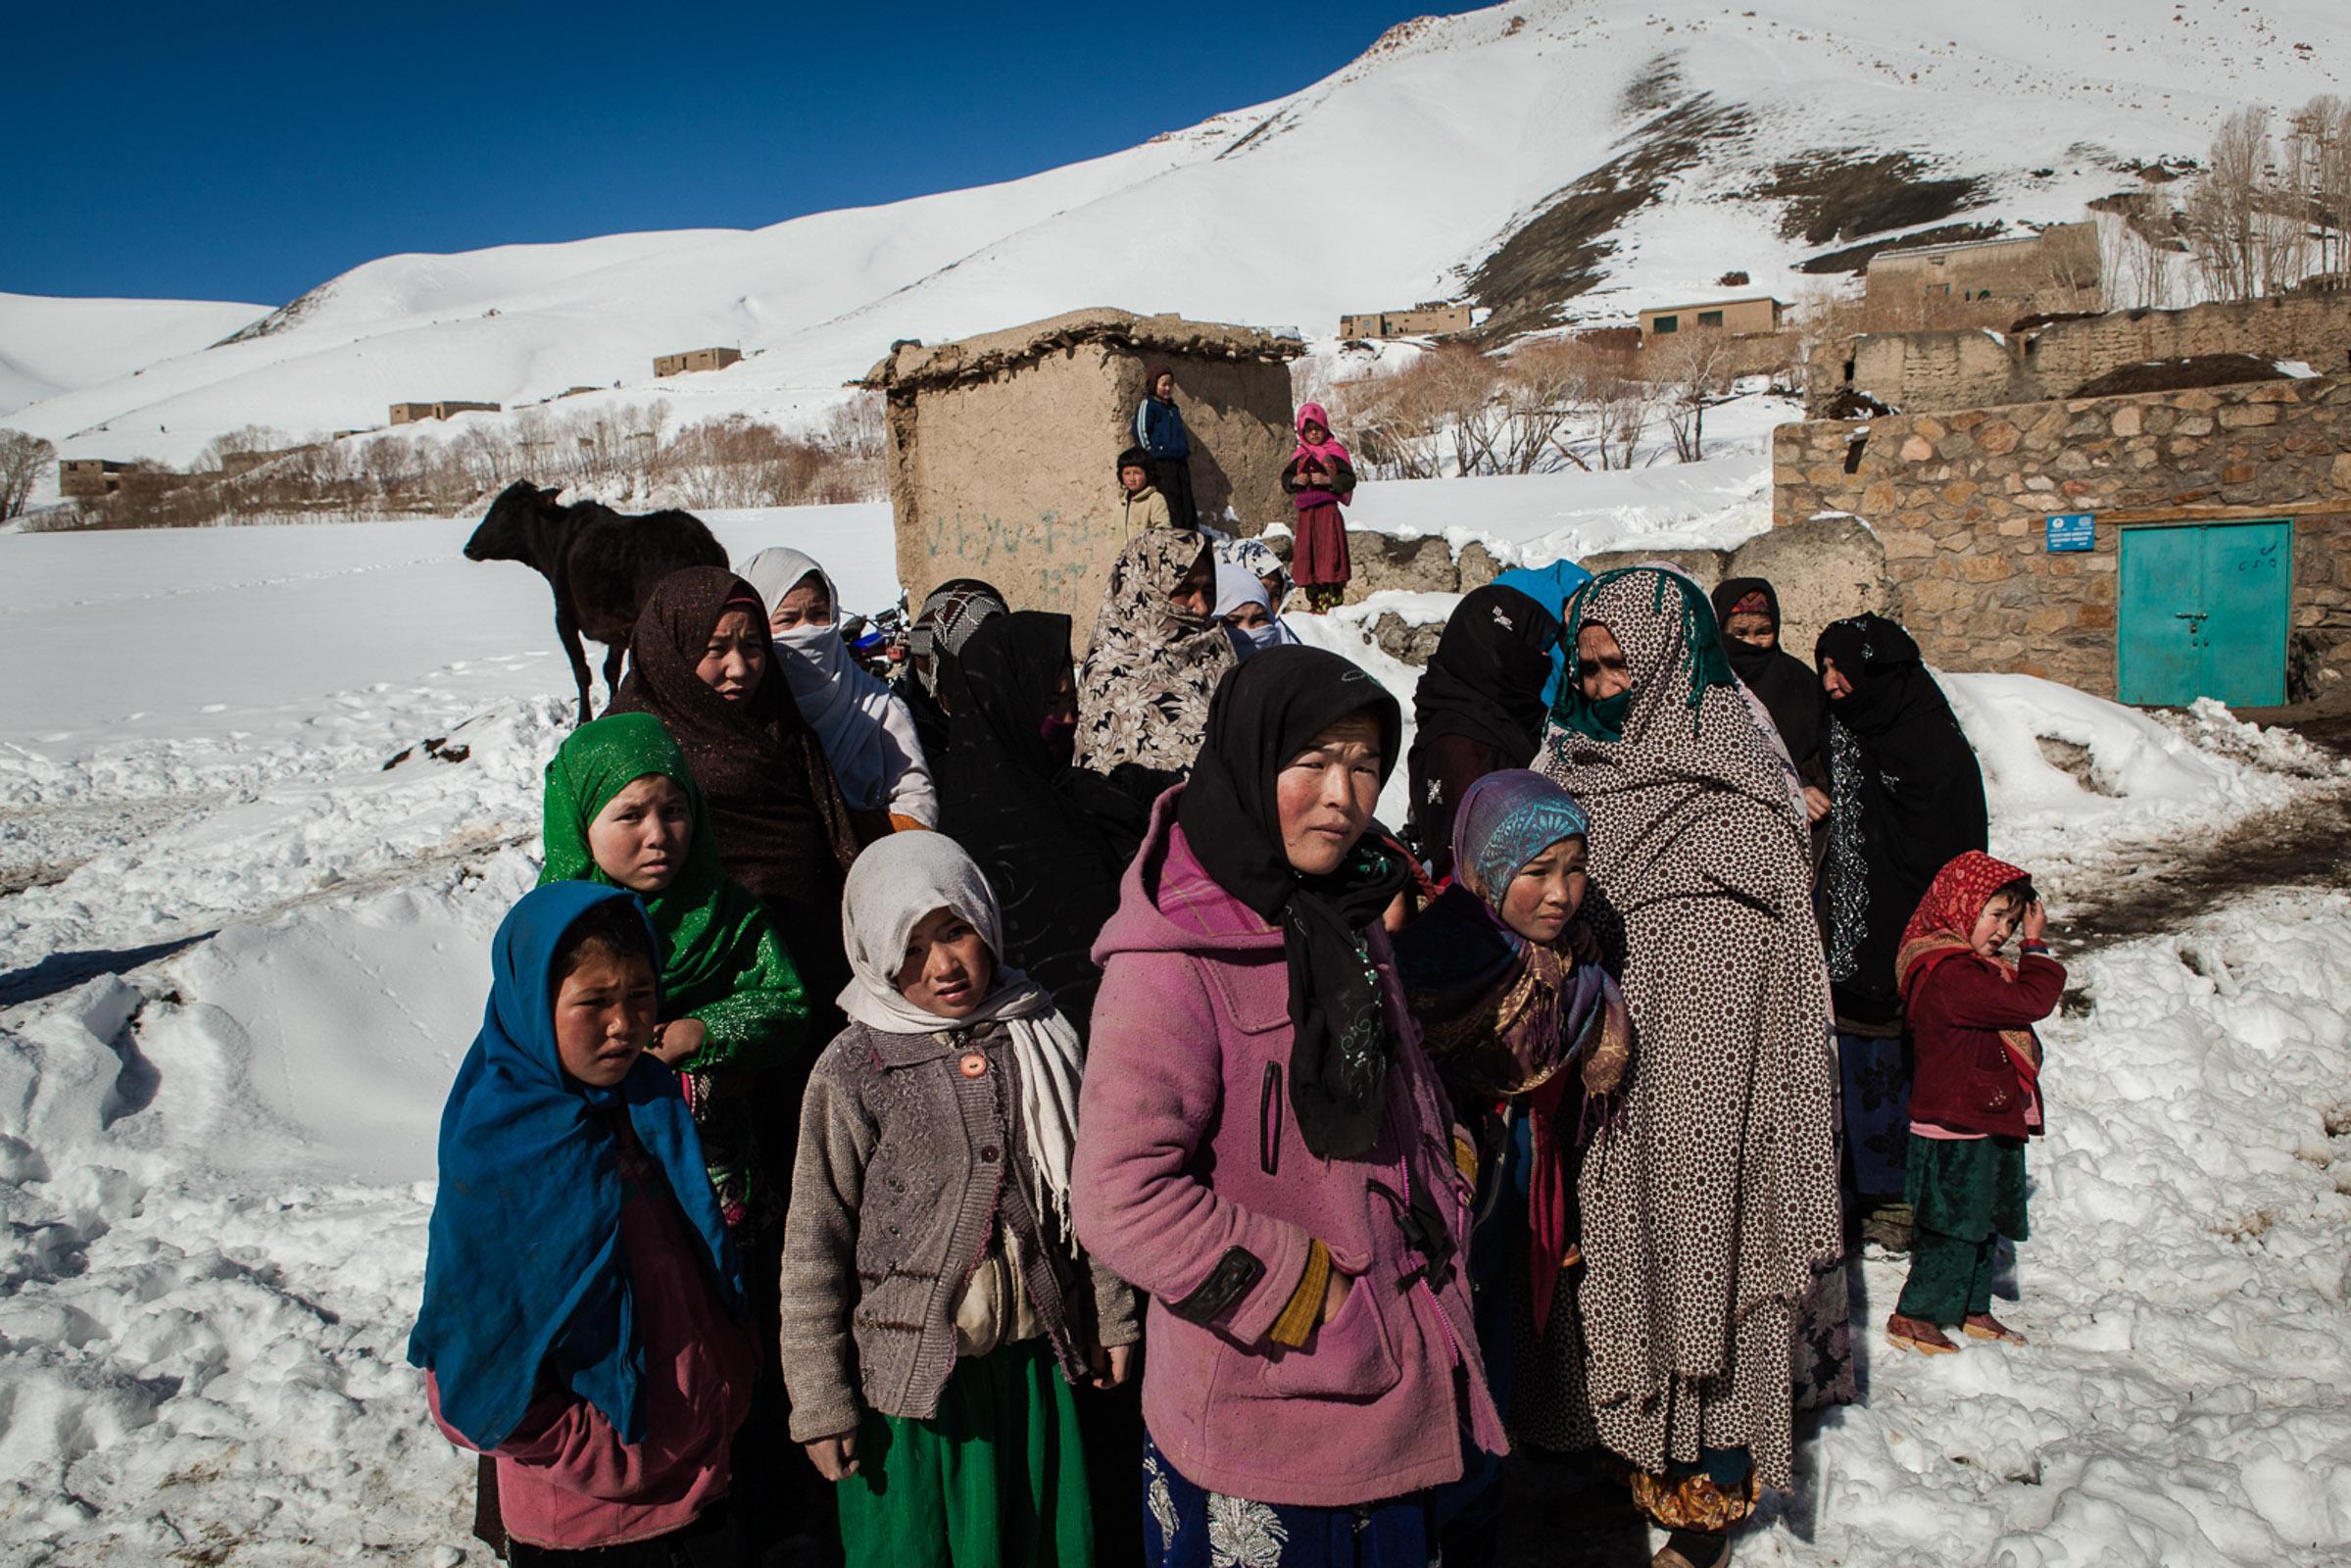 Koh-e-baba, province de Bamiyan, 1er Mars 2013. arrivée dans le village du départ de l'afghan ski challenge.   Koh-e-Baba, Bamiyan Province, March 1, 2013. Arriving in the village of the Afghan ski challenge.